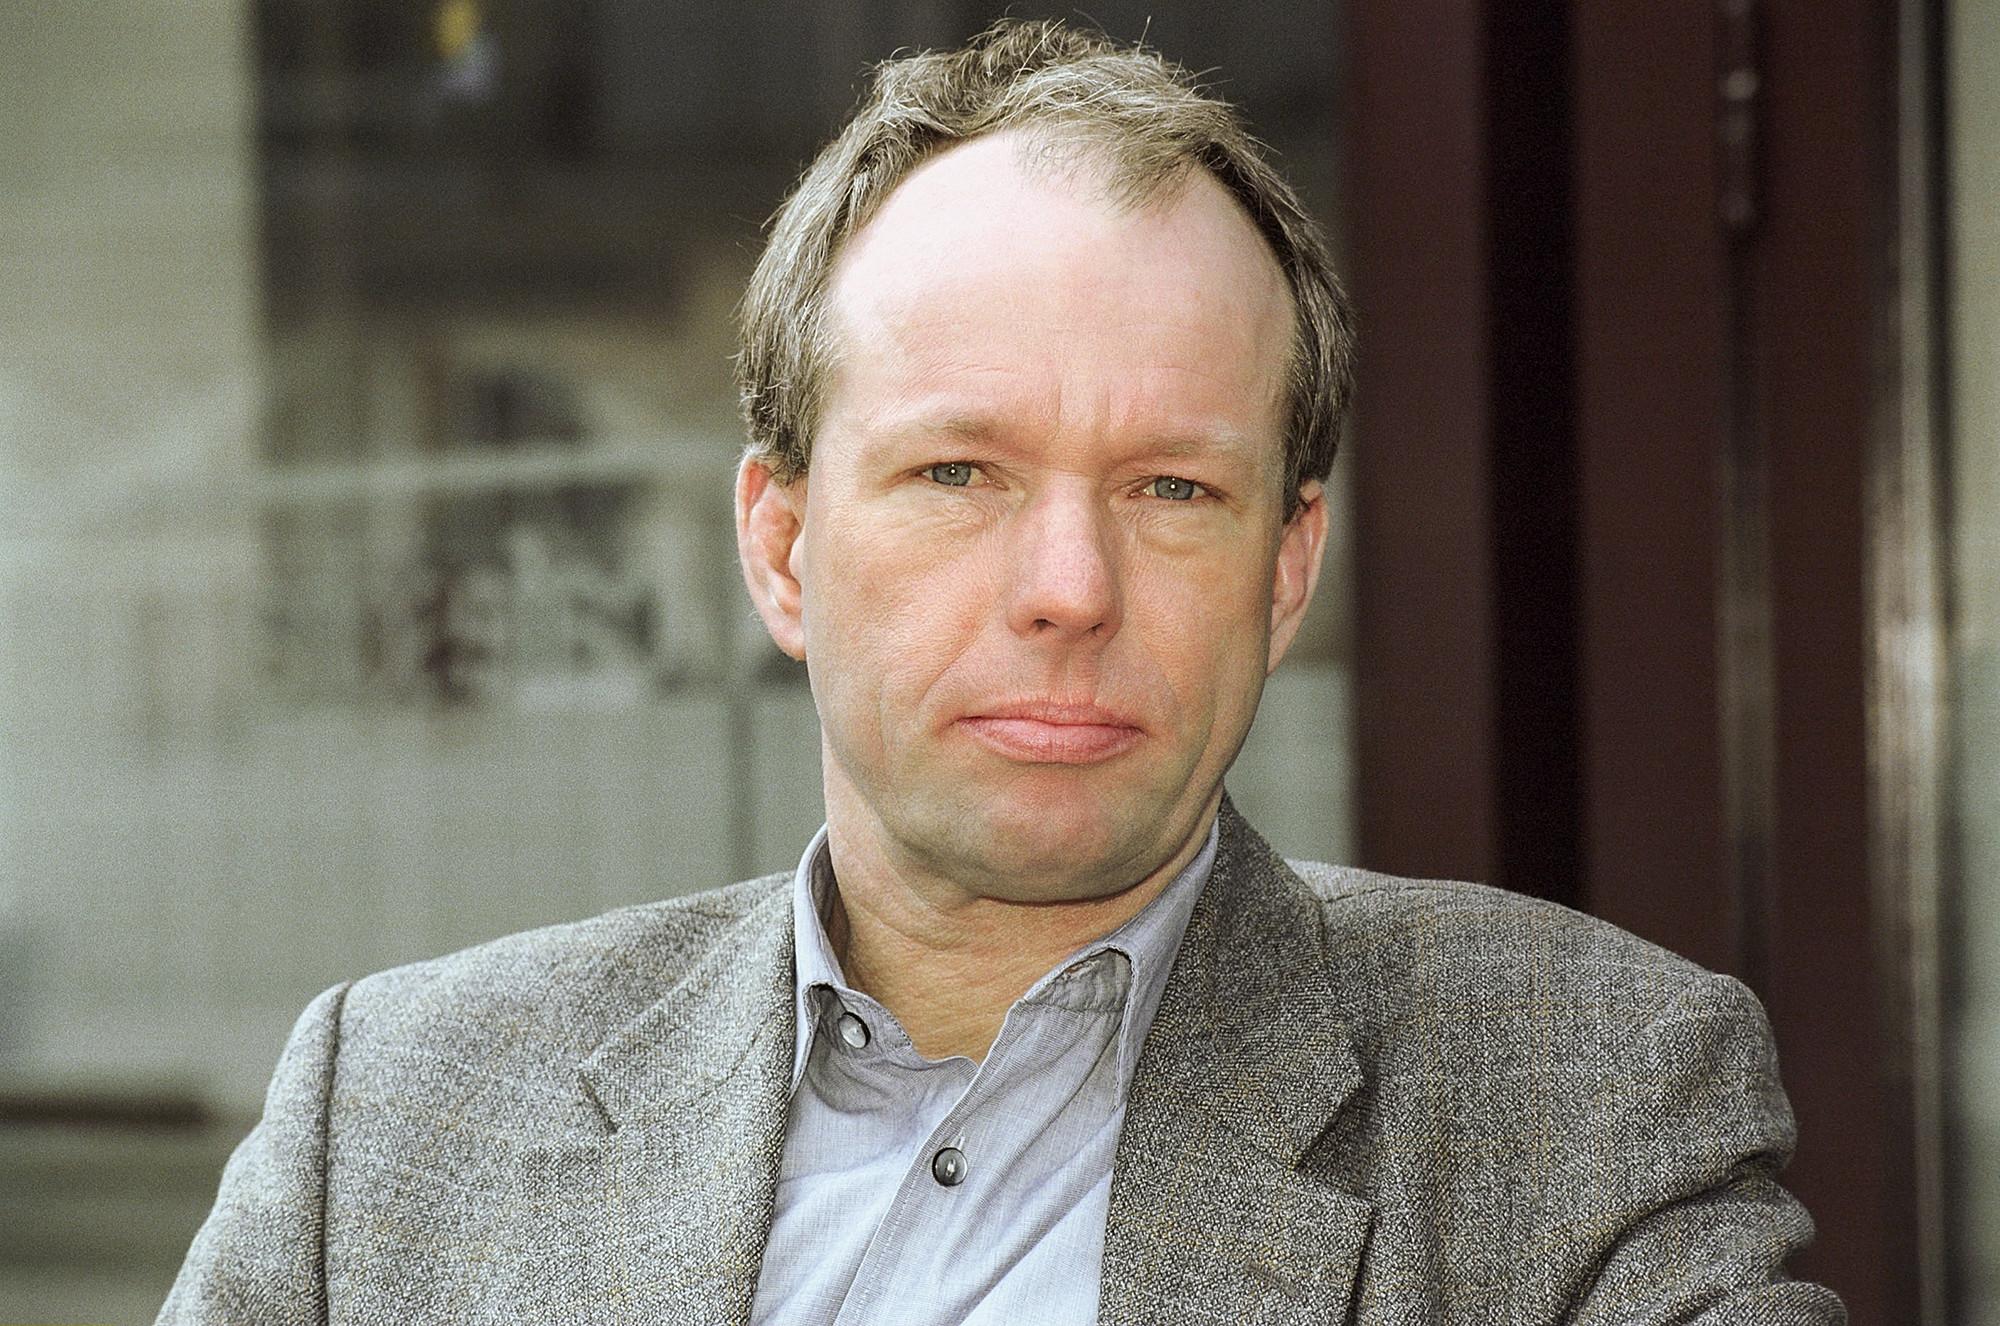 (GERMANY OUT) Soziologe, DProfessor f?r Soziologie an der Universit?t Witten-HerdeckePortr?t- 30.03.2003 (Photo by Poklekowsk